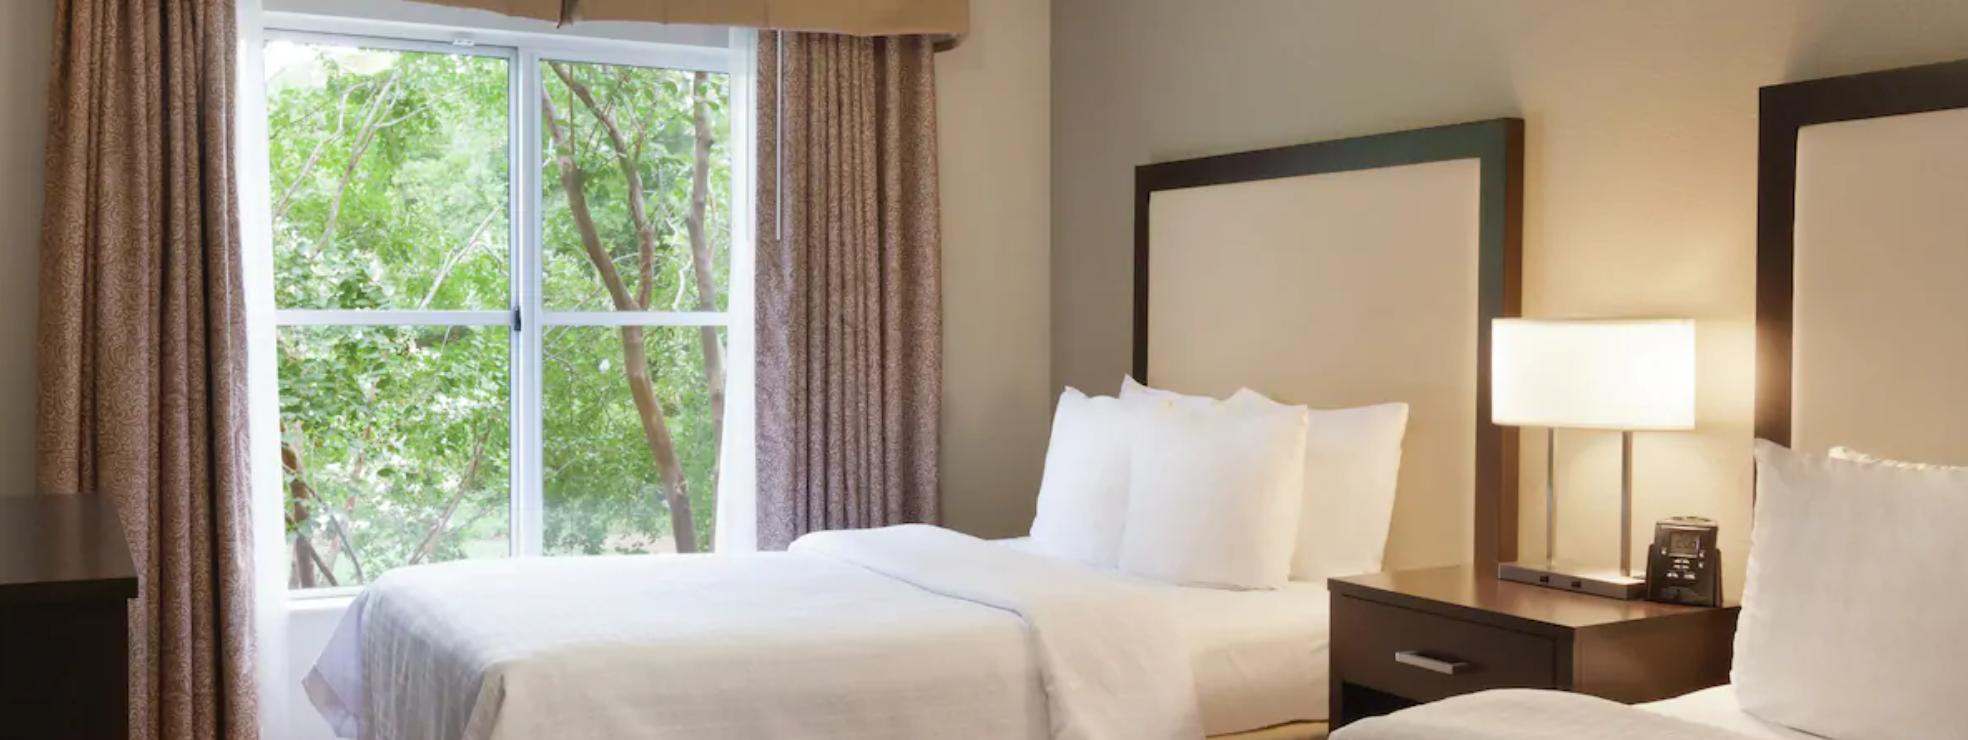 https://www.hotelsbyday.com/_data/default-hotel_image/3/18204/screenshot-2020-06-11-at-4-23-44-pm.png